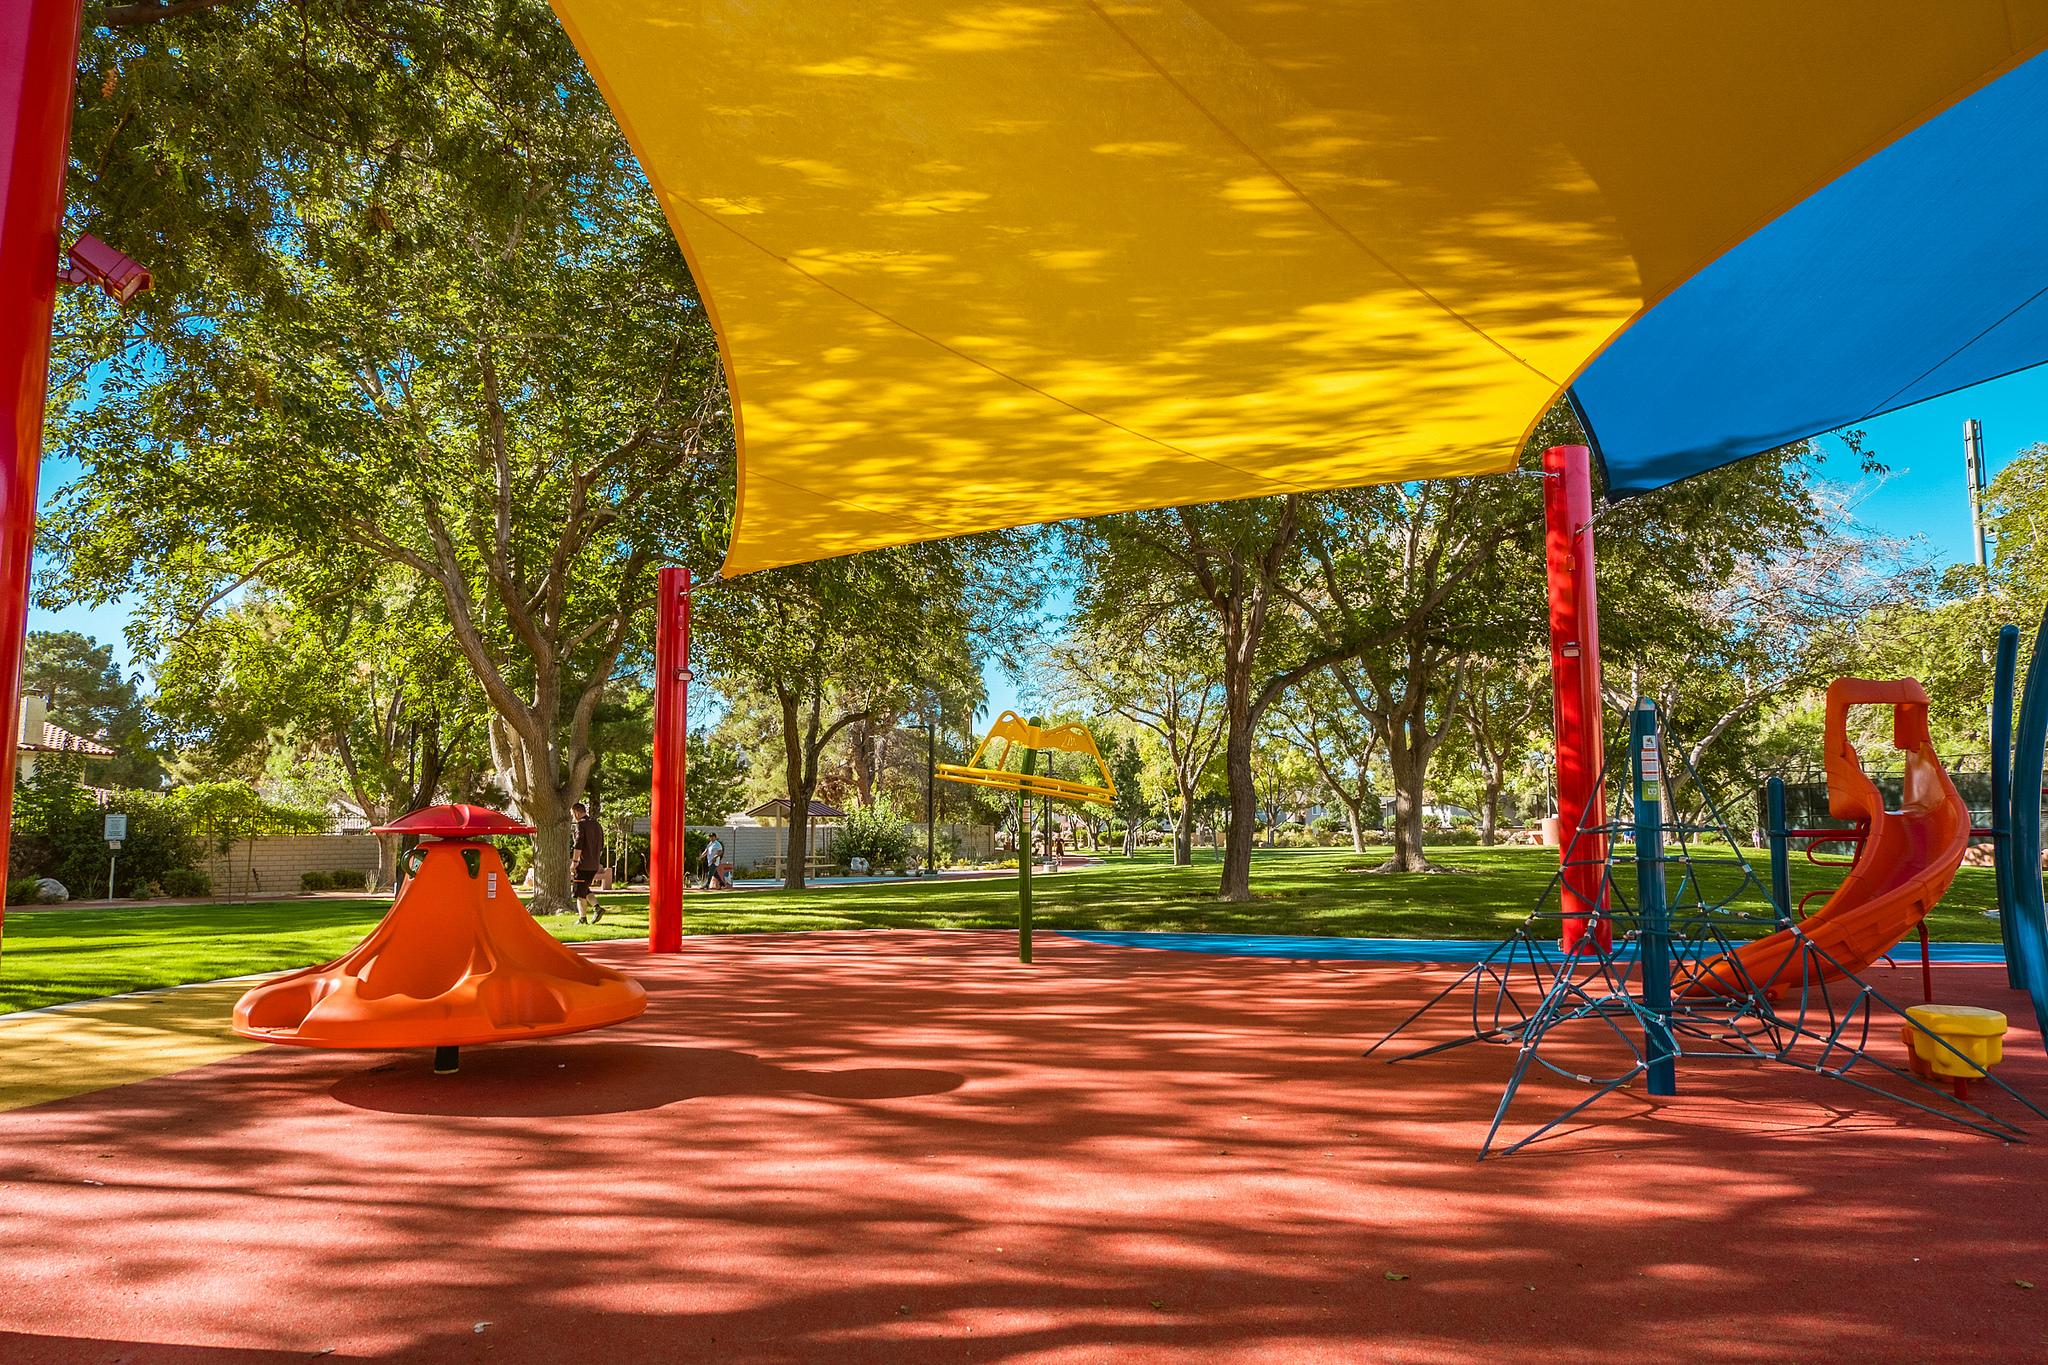 City of las vegas park playground updates and closures